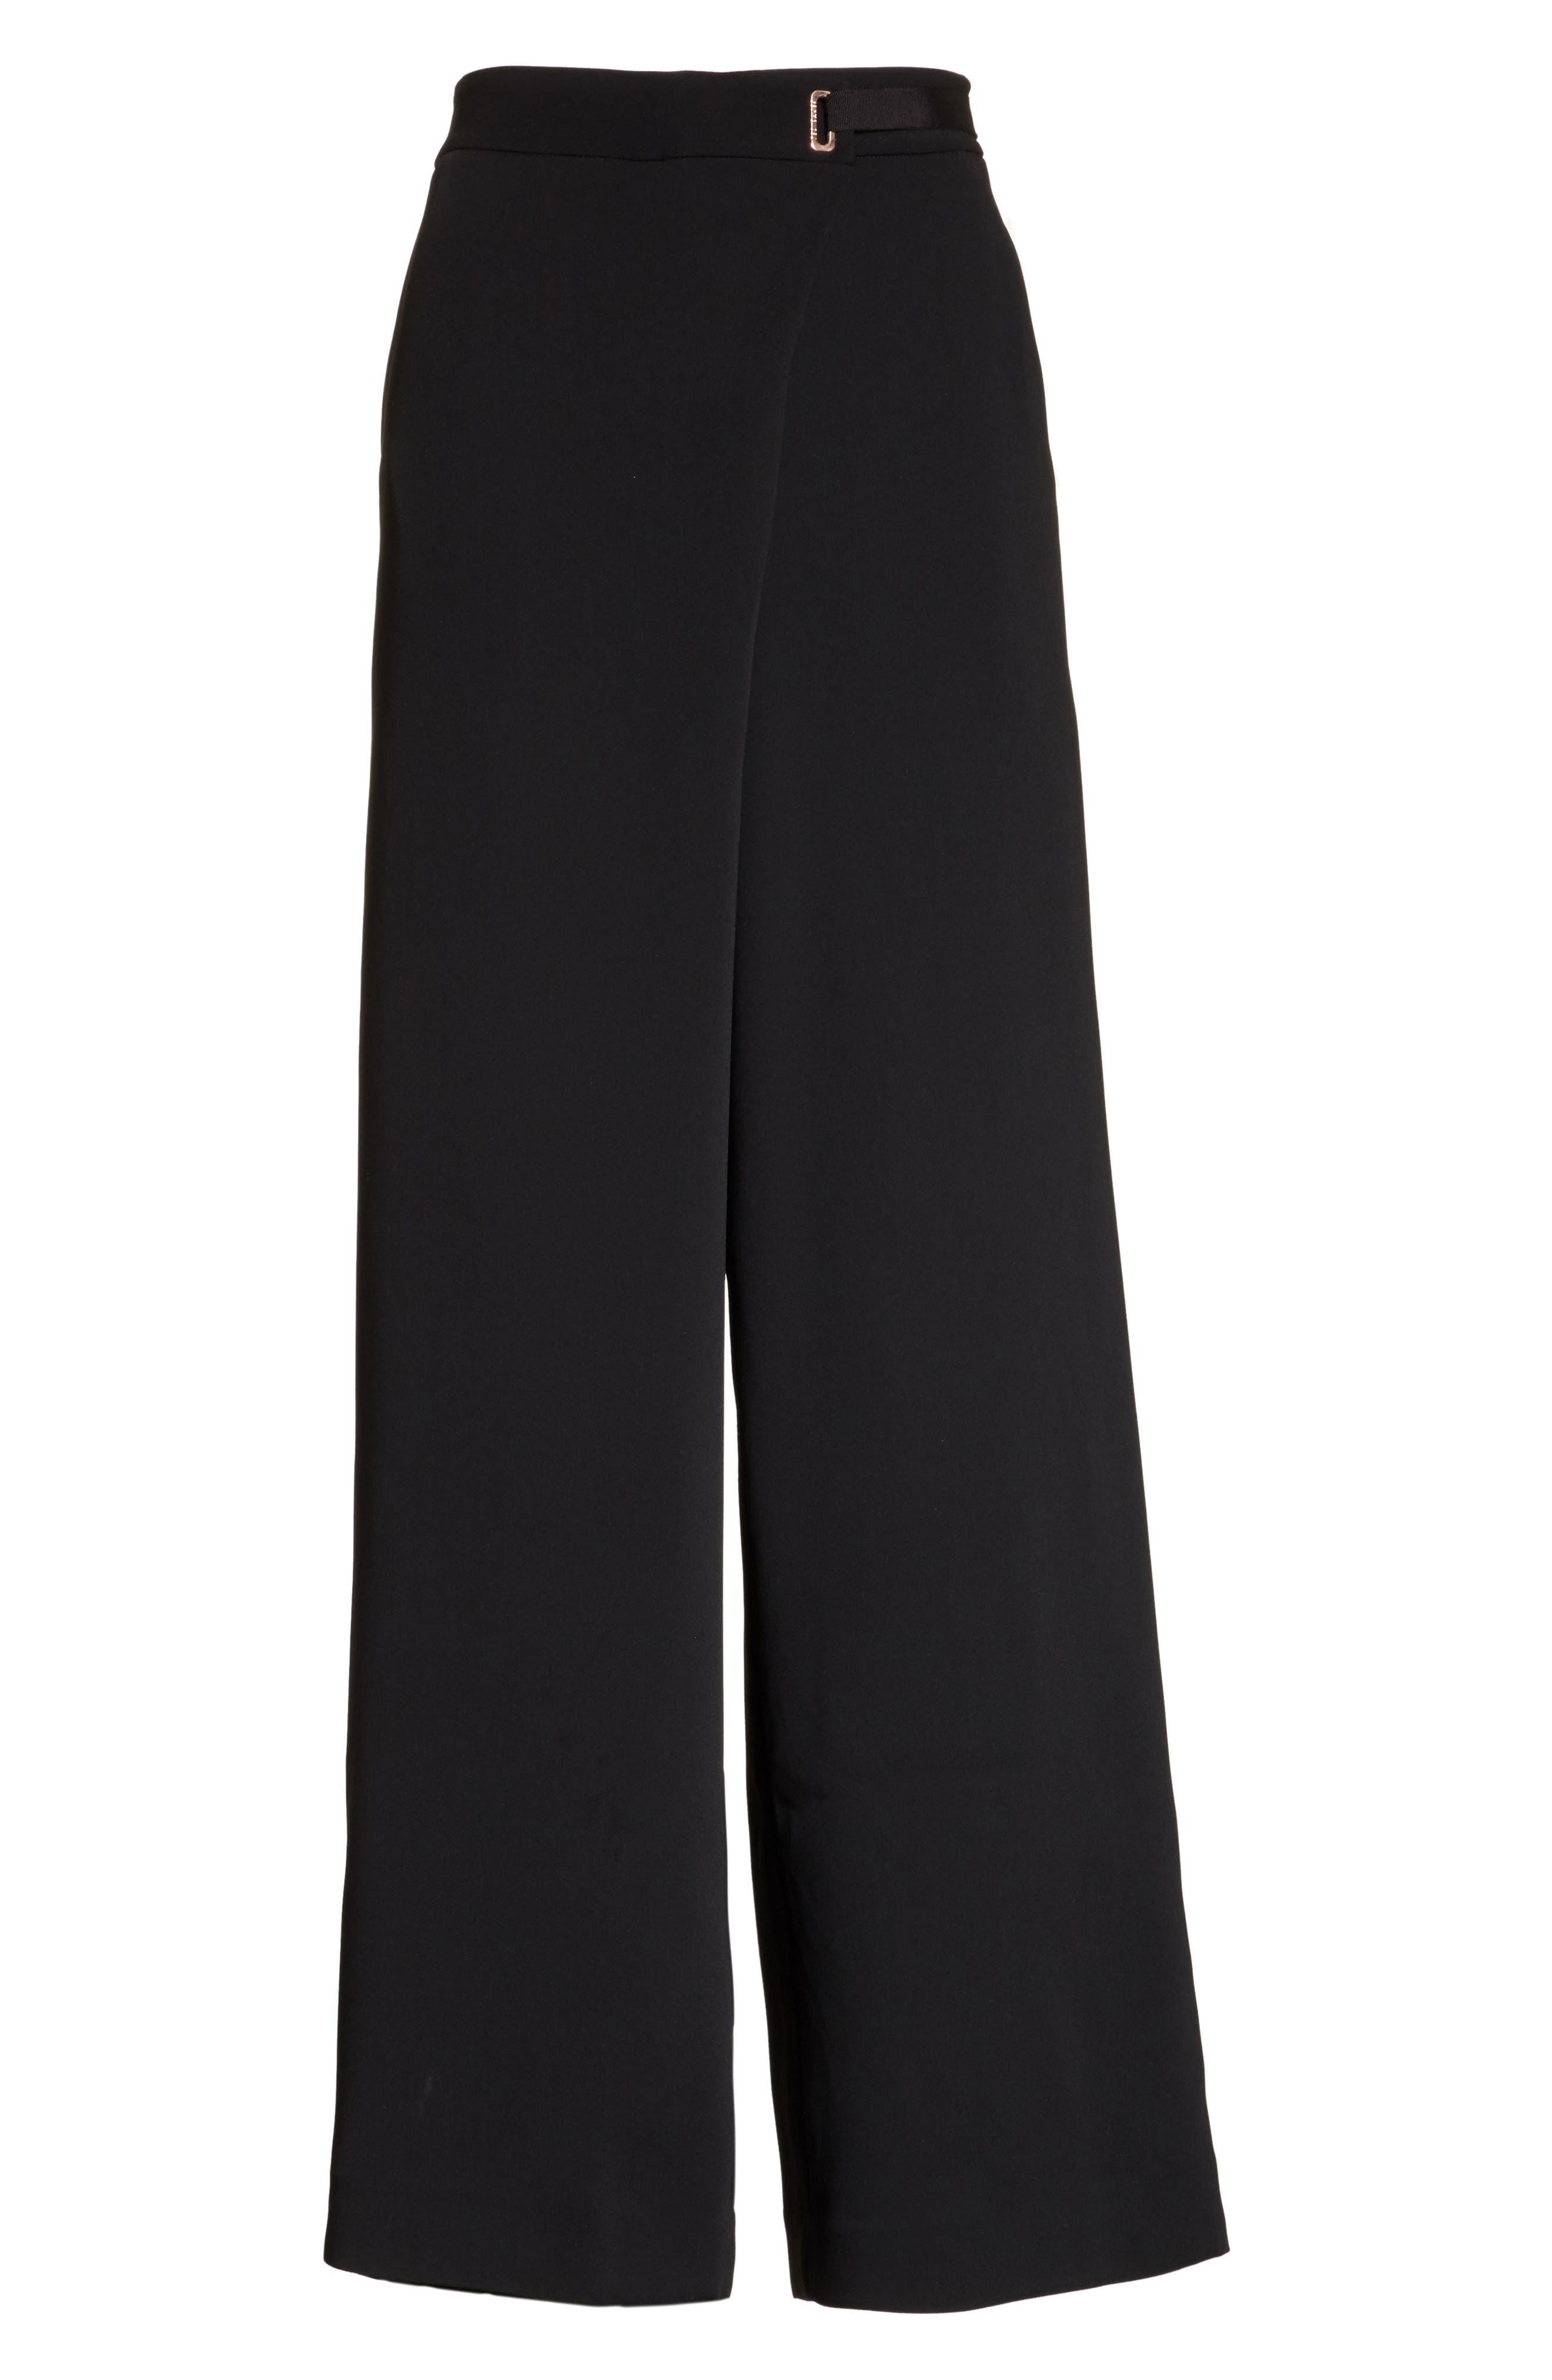 Yasin Wide Leg Wrap Front Trousers,                             Alternate thumbnail 6, color,                             001